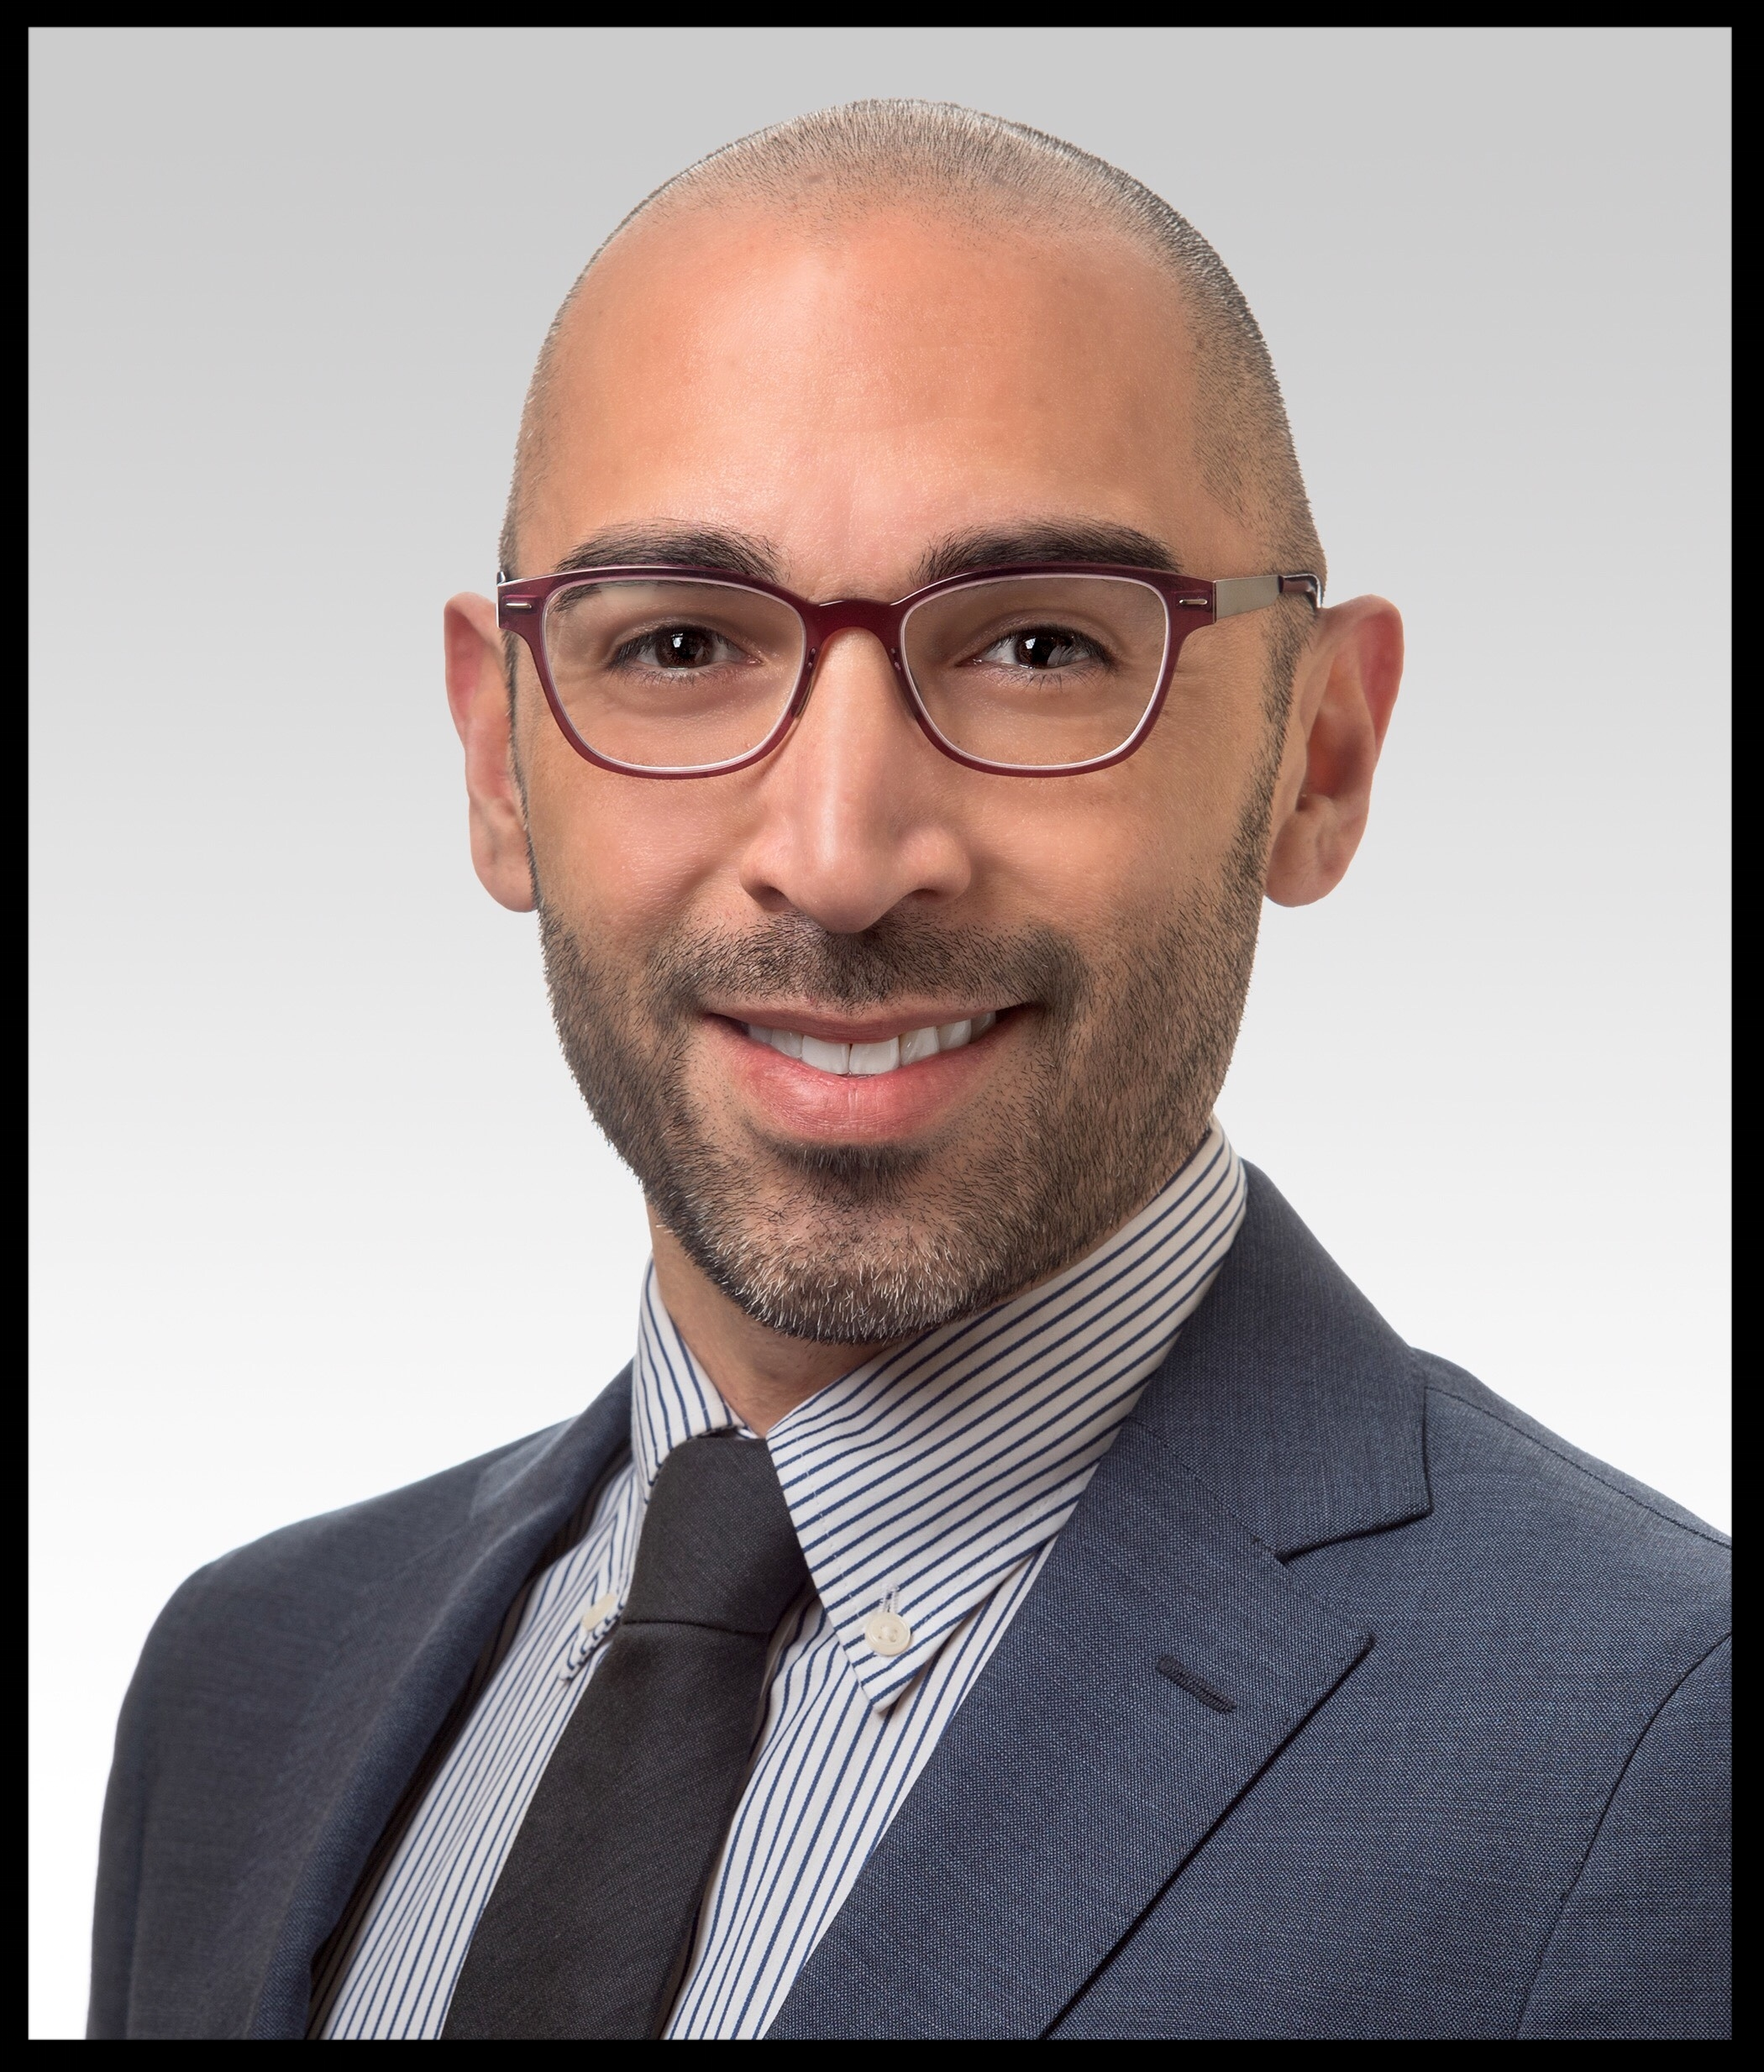 Marco-Hidalgo-PhD.jpg